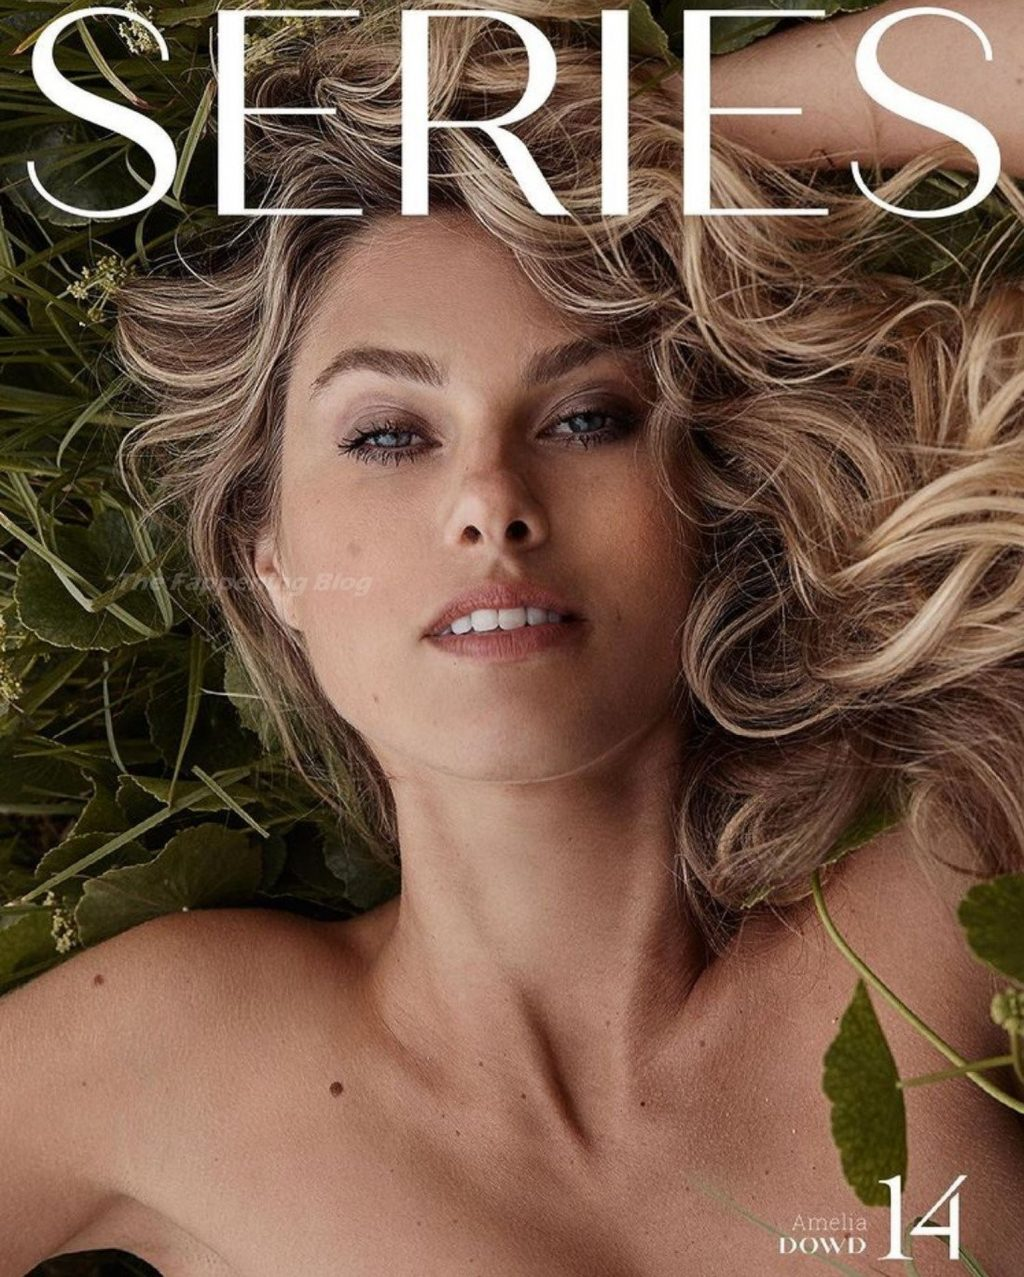 Natalie Jayne Roser Nude – Series Magazine (14 Photos)